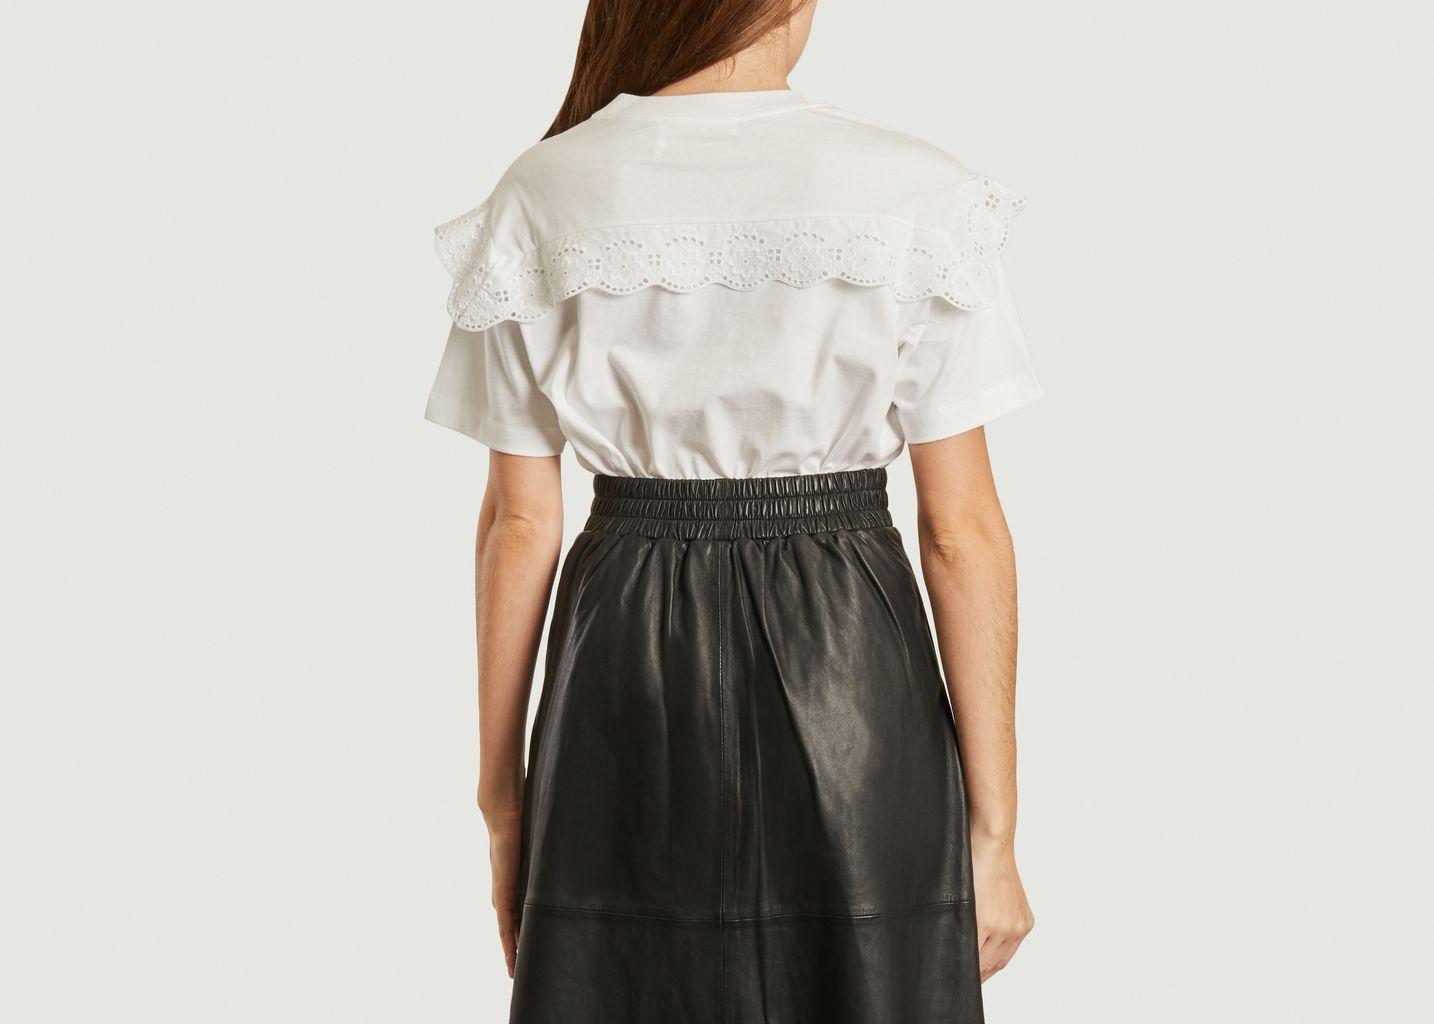 T-shirt avec empiècement dentelle - See by Chloé